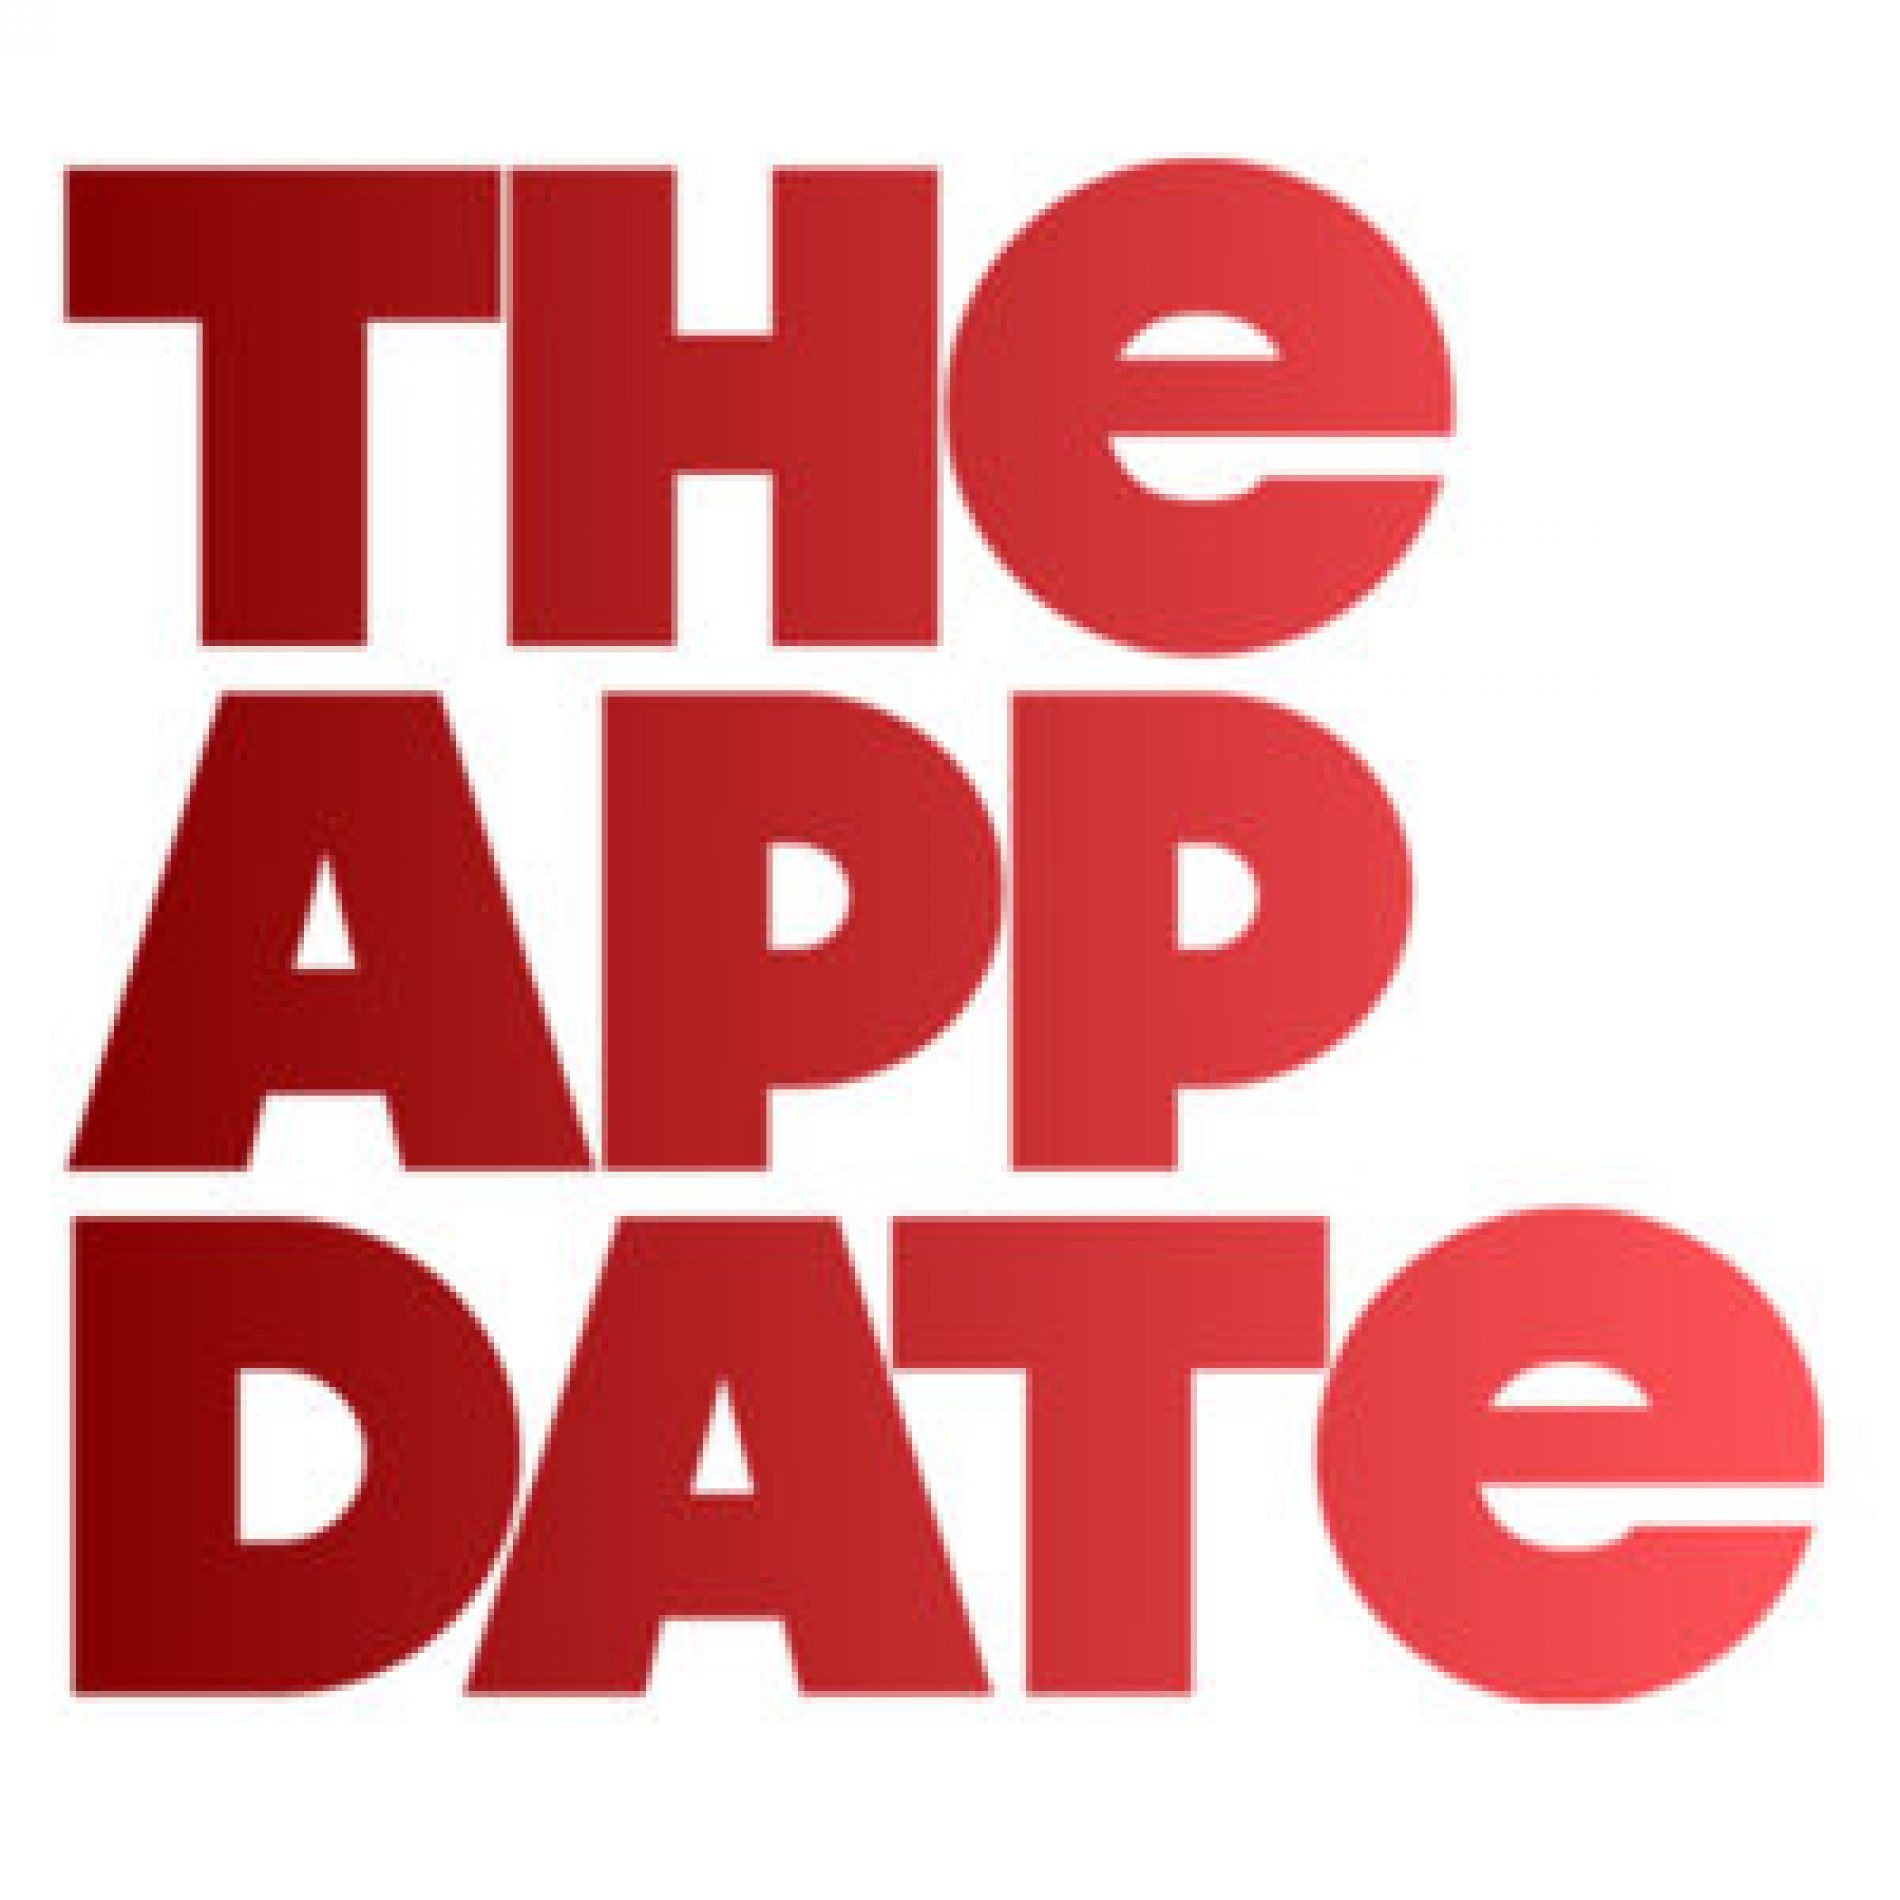 The App Fake